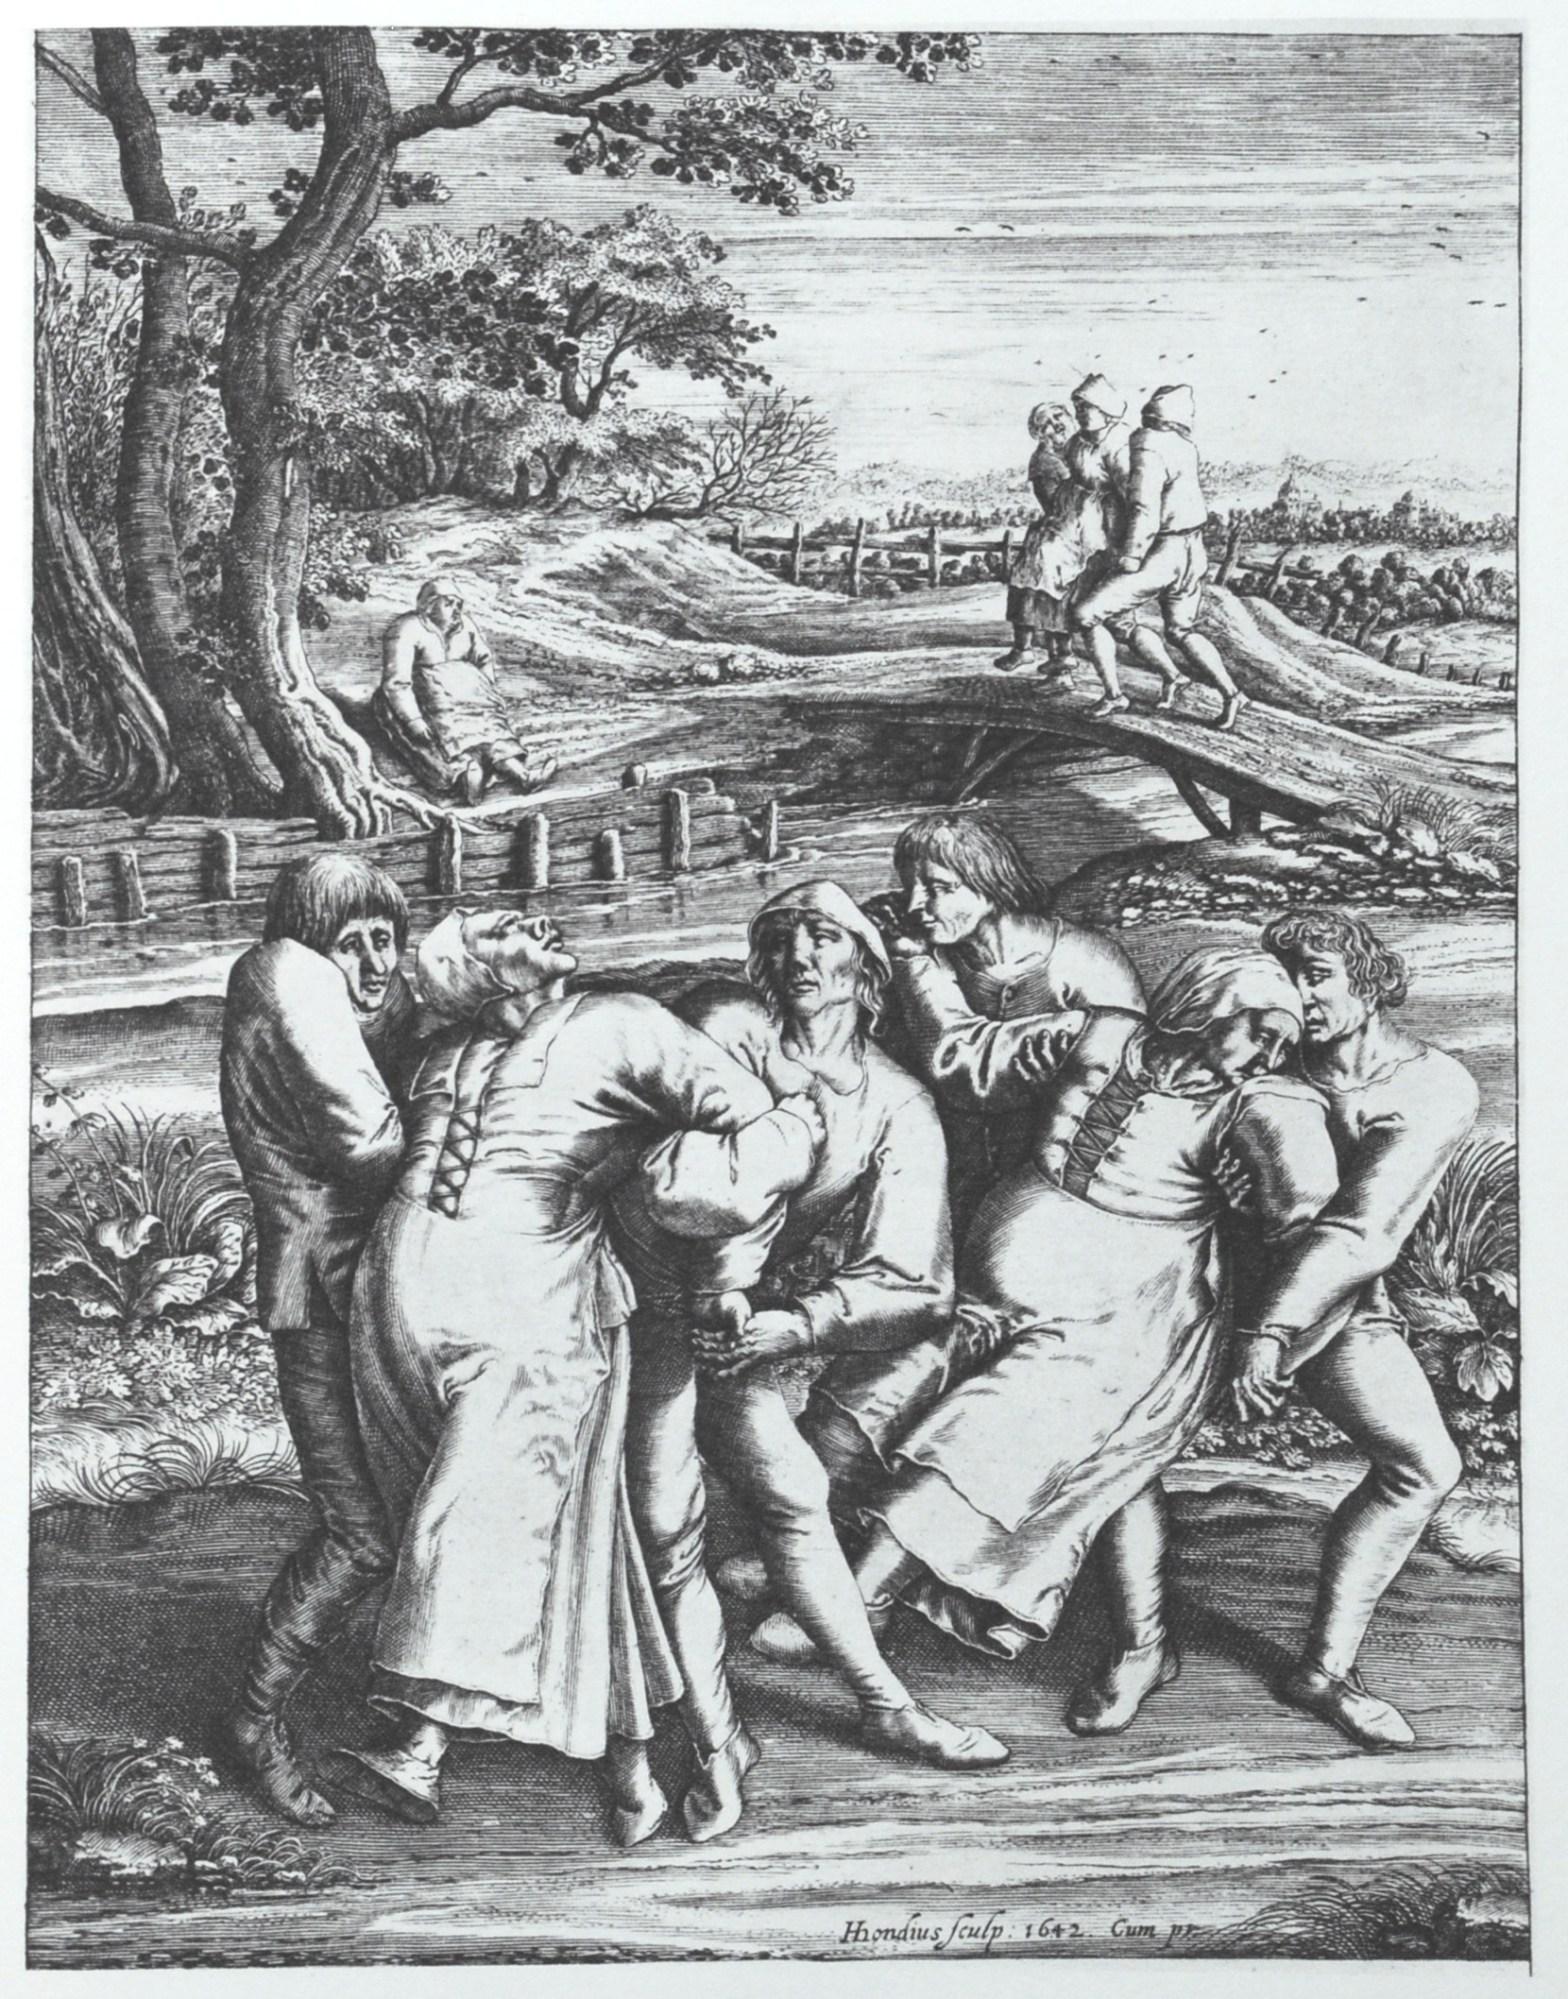 Die Wallfahrt der Fallsuechtigen nach Meulebeeck Pieter Bruegel